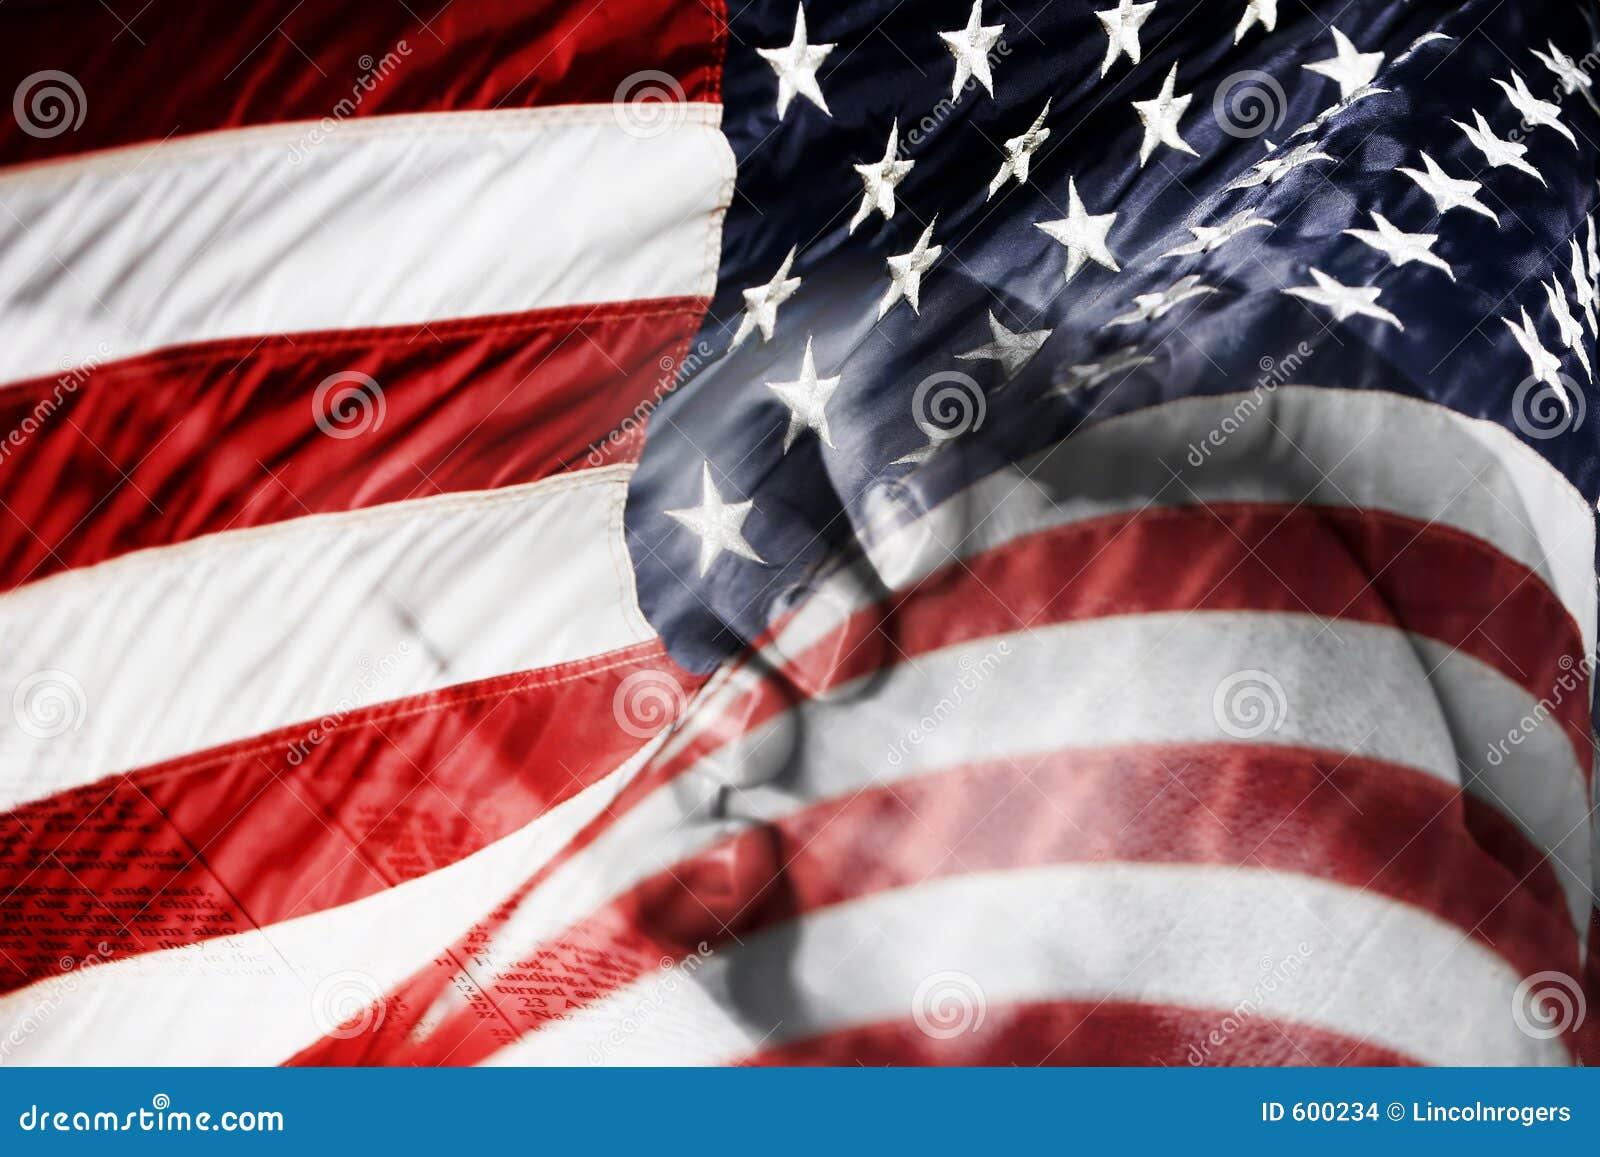 American Flag & Praying Hands (Blended Image)